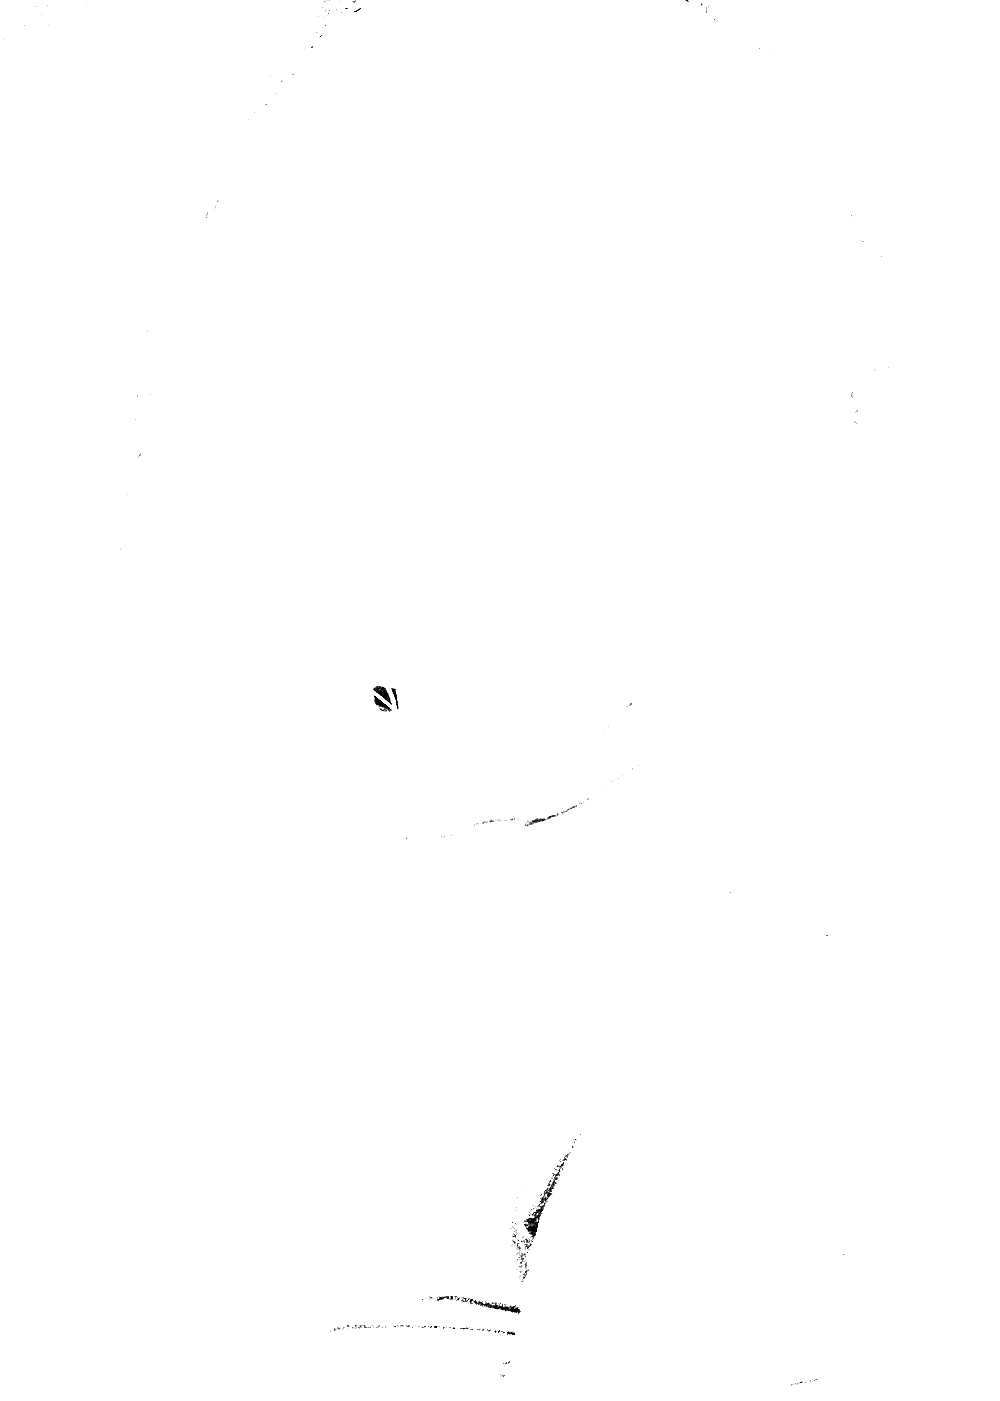 20161218-DSC_9474.png